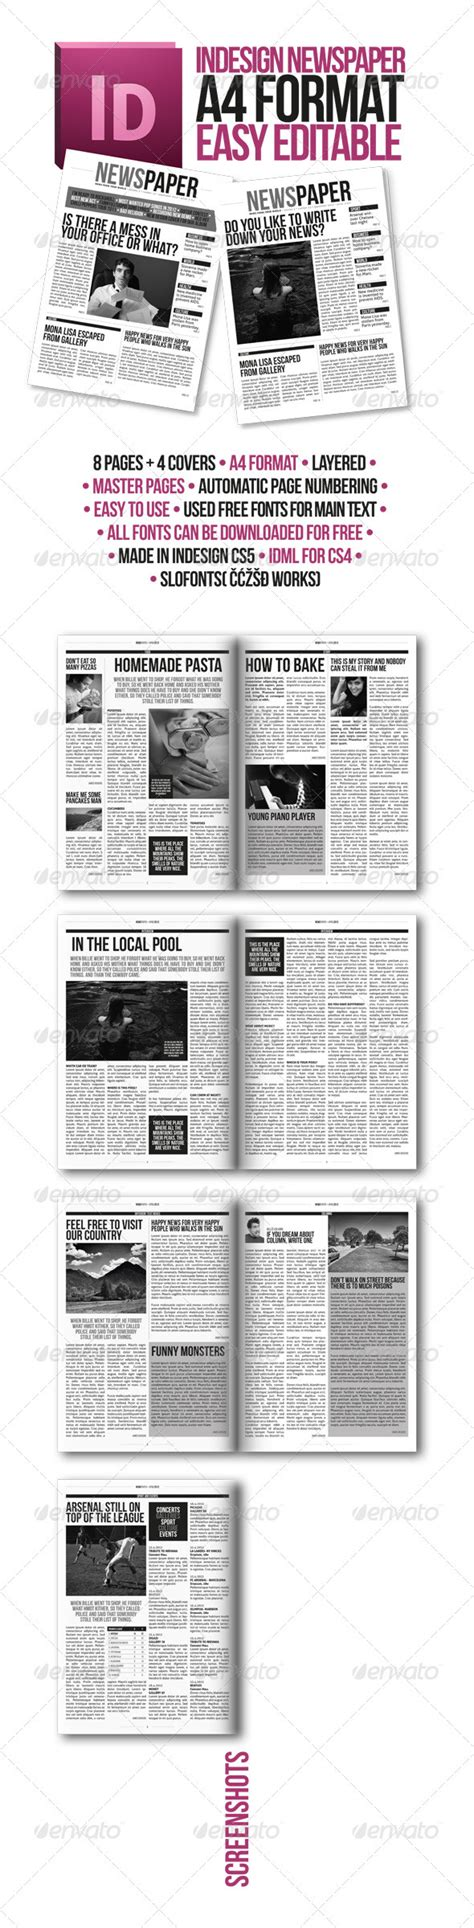 indesign newspaper template indesign modern newspaper magazine template a4 by zigazi83 graphicriver